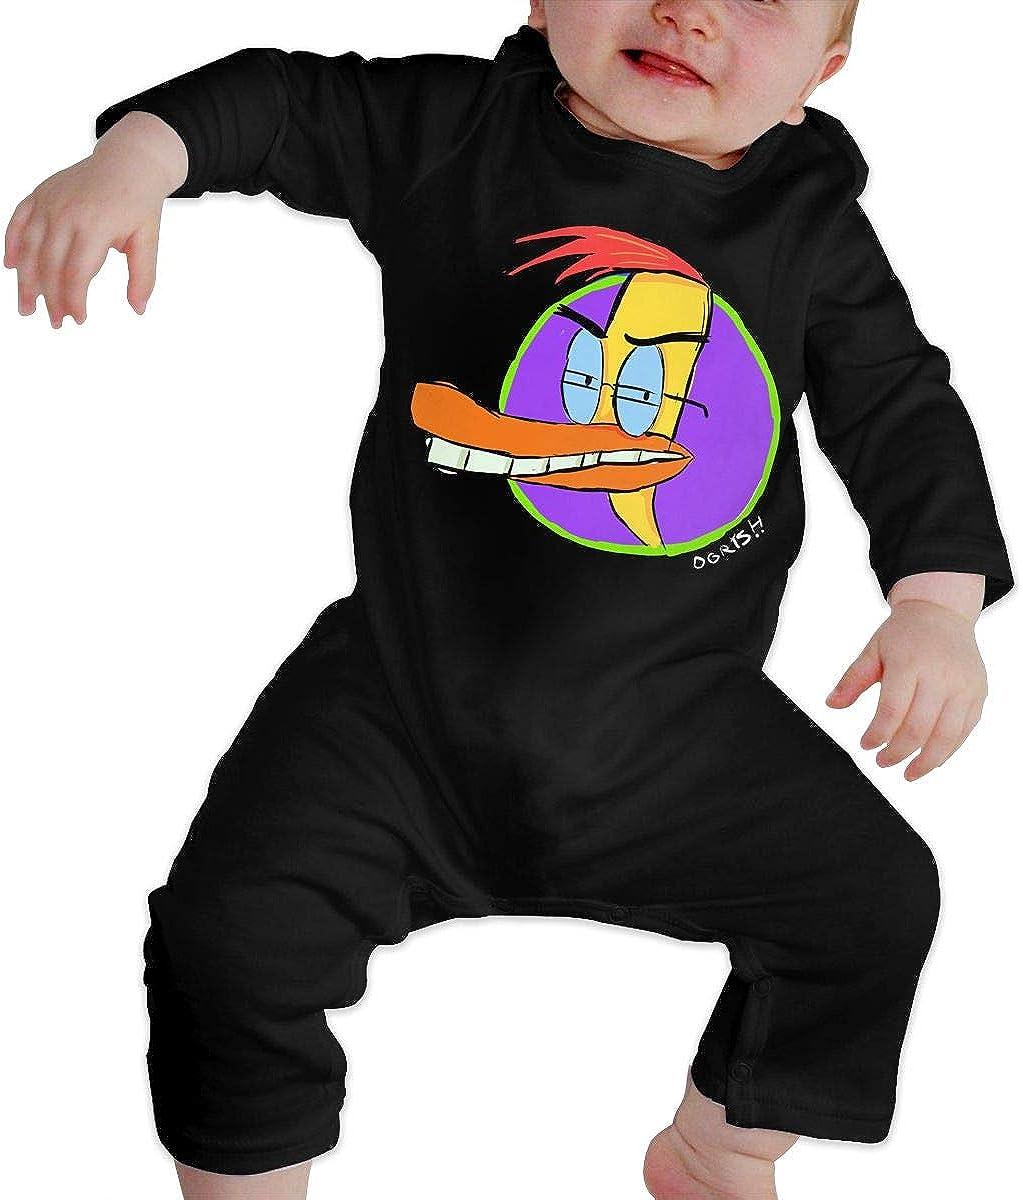 MasakoJMassie Duckman Newborn Baby Long Sleeve Babies Cotton Infant Undershirts Bodysuit